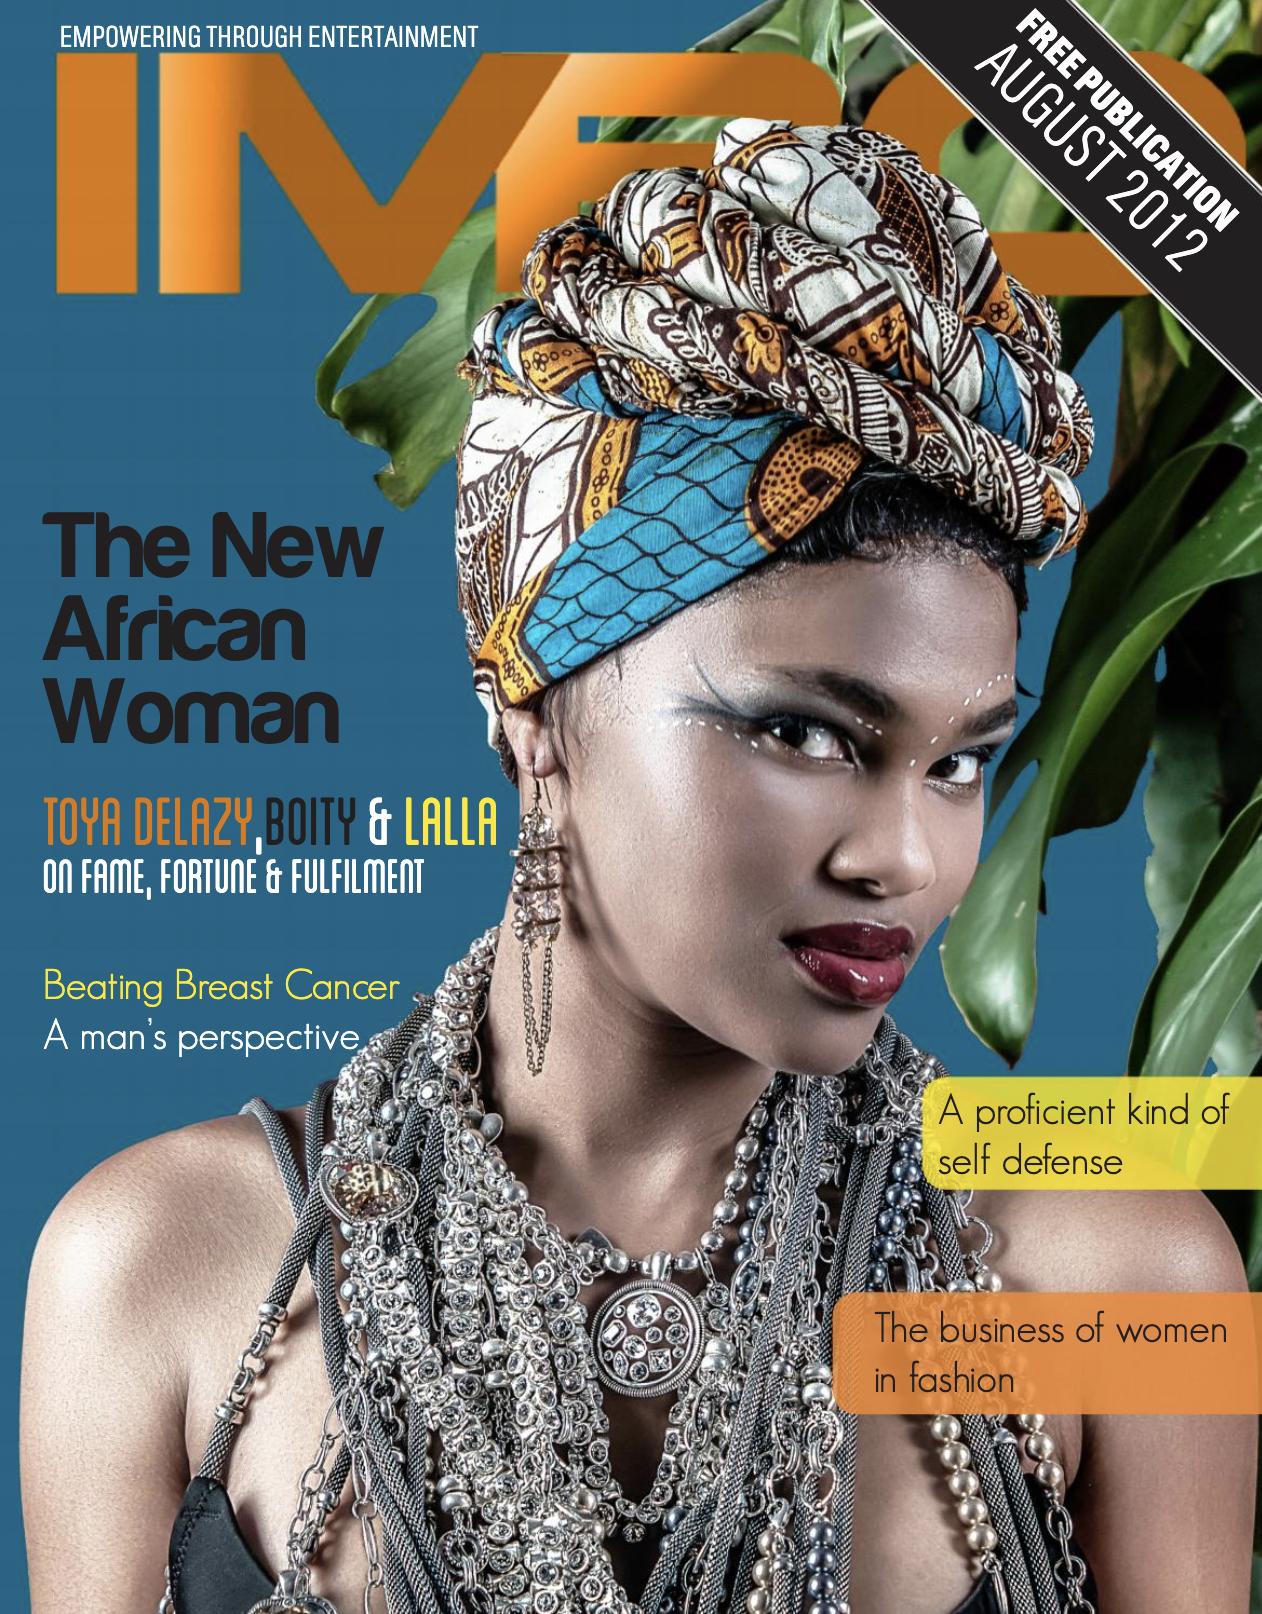 Imbo Magazine Cover Page